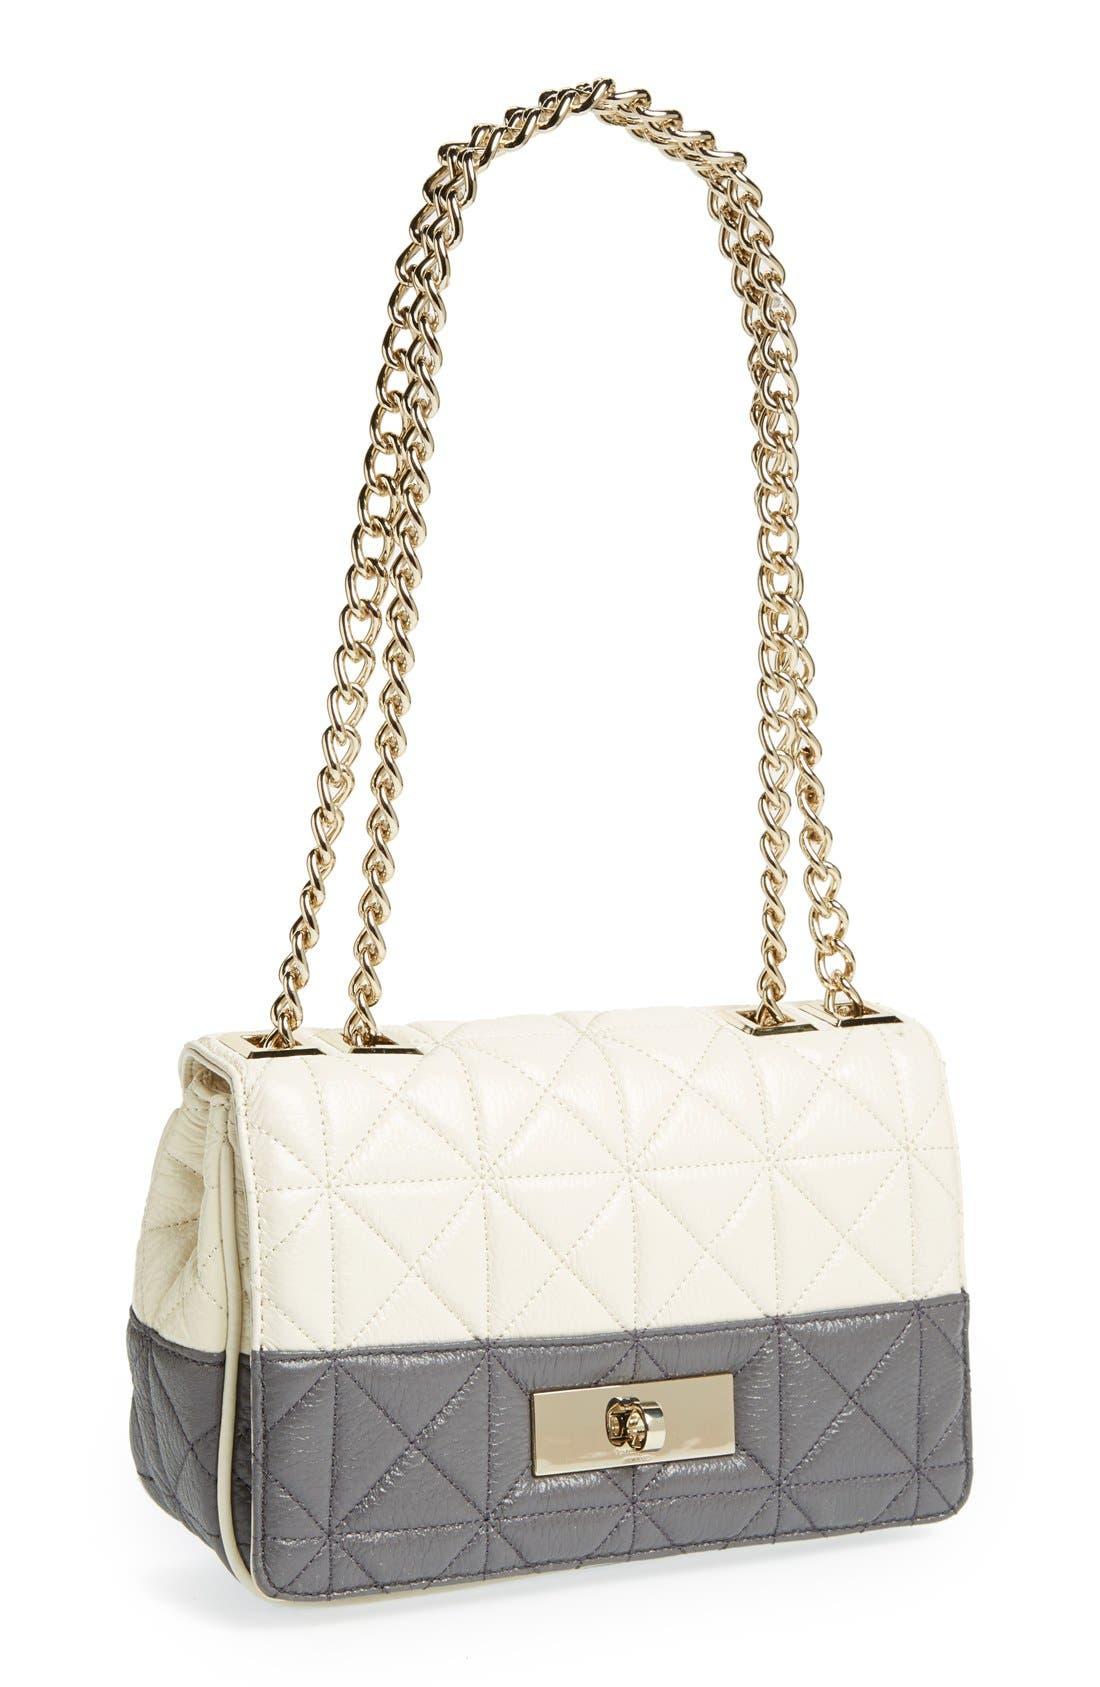 Main Image - kate spade new york 'segewick place - fairlee' crossbody bag